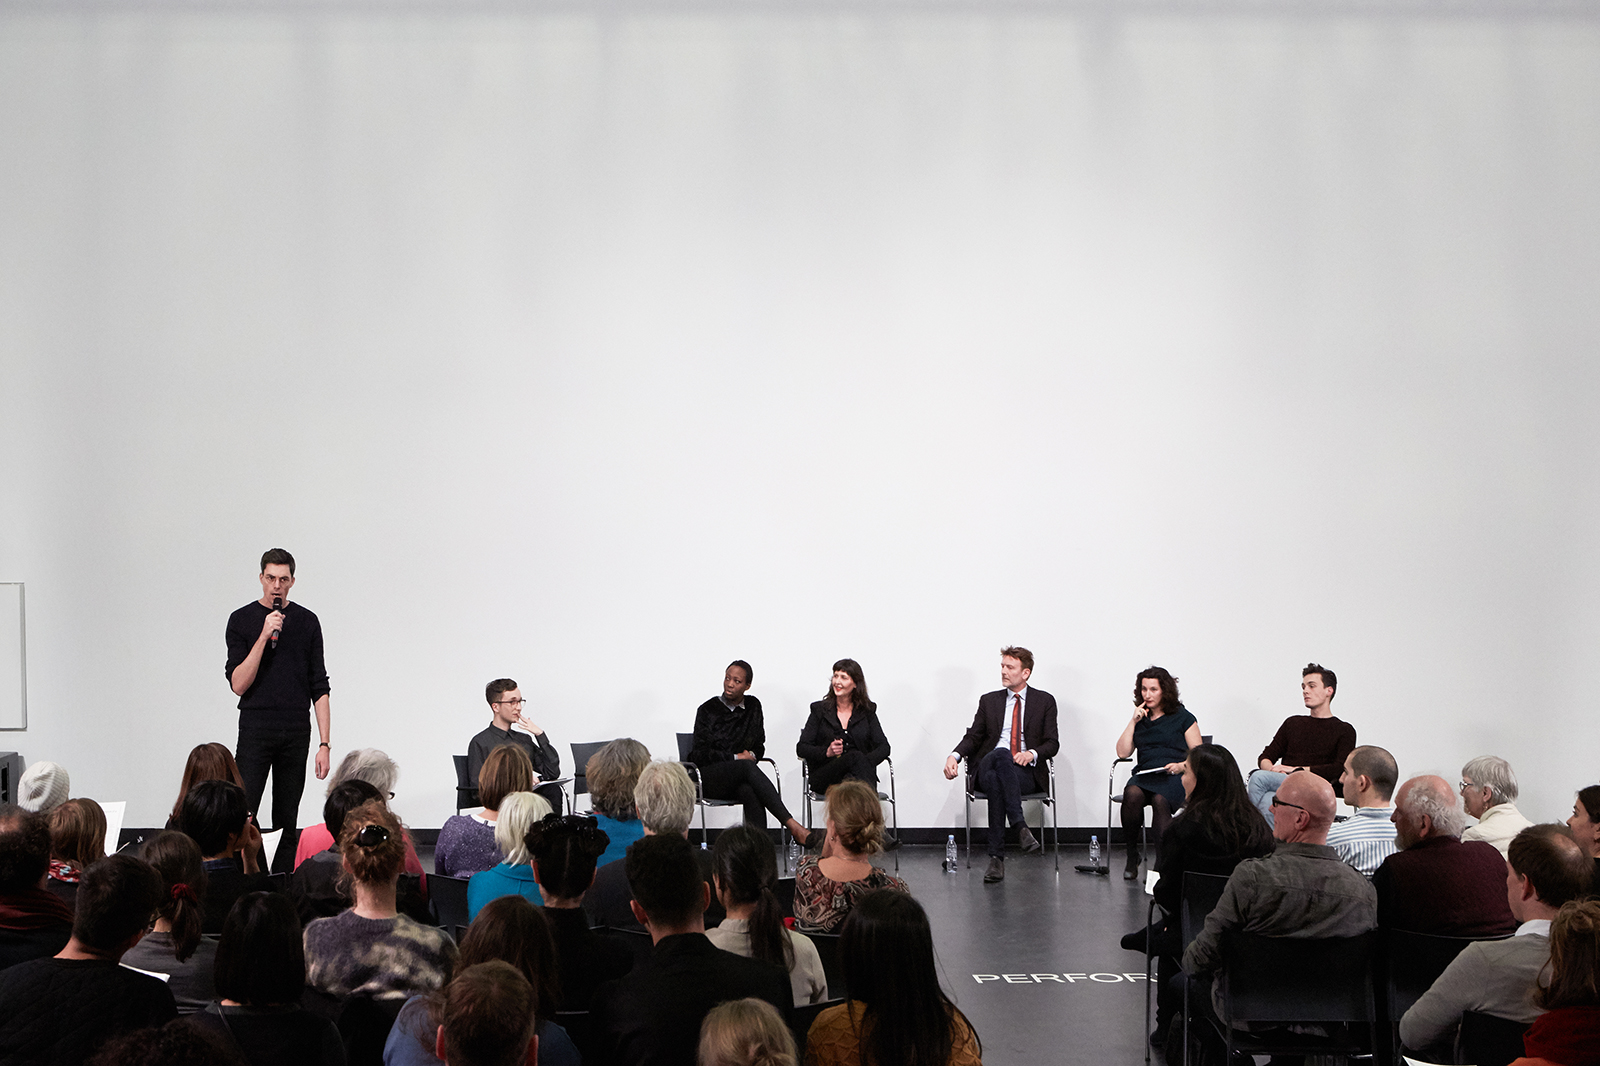 Performance of a Massacre